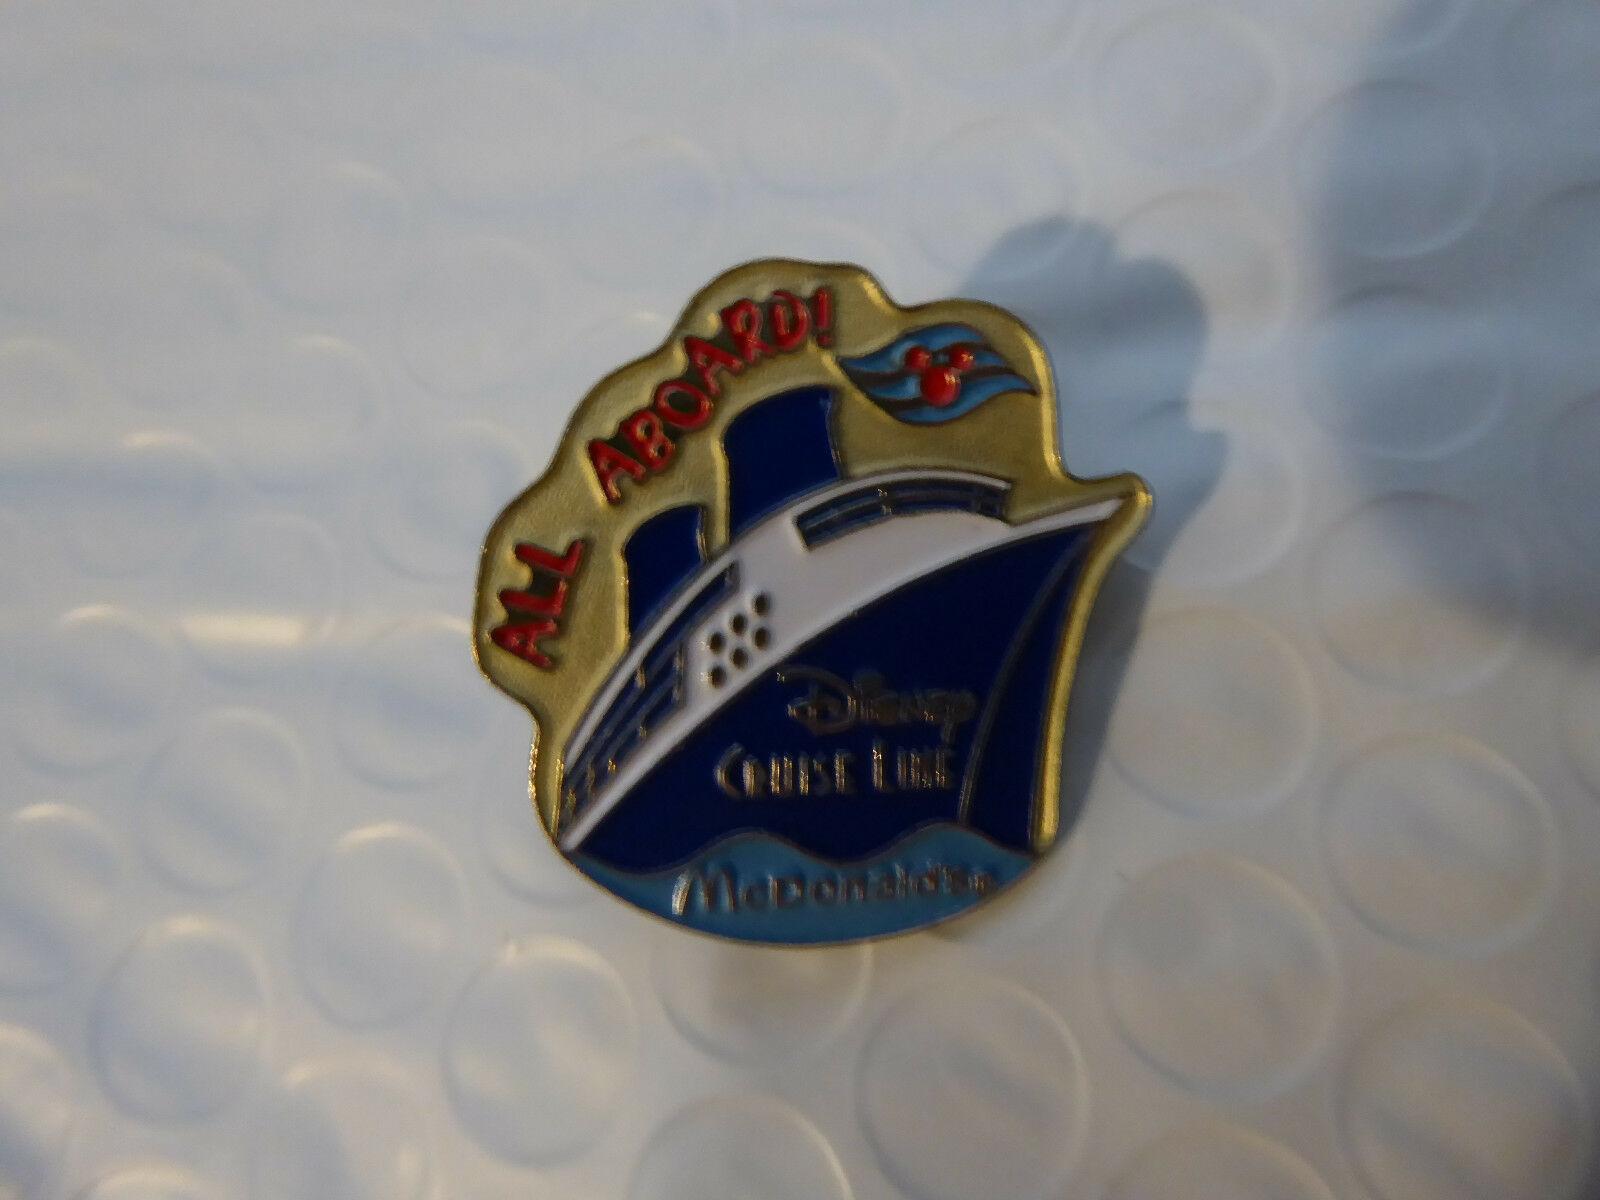 Disney Trading Broches 847 Mcdonalds Disney Cruise Ligne - $7.62